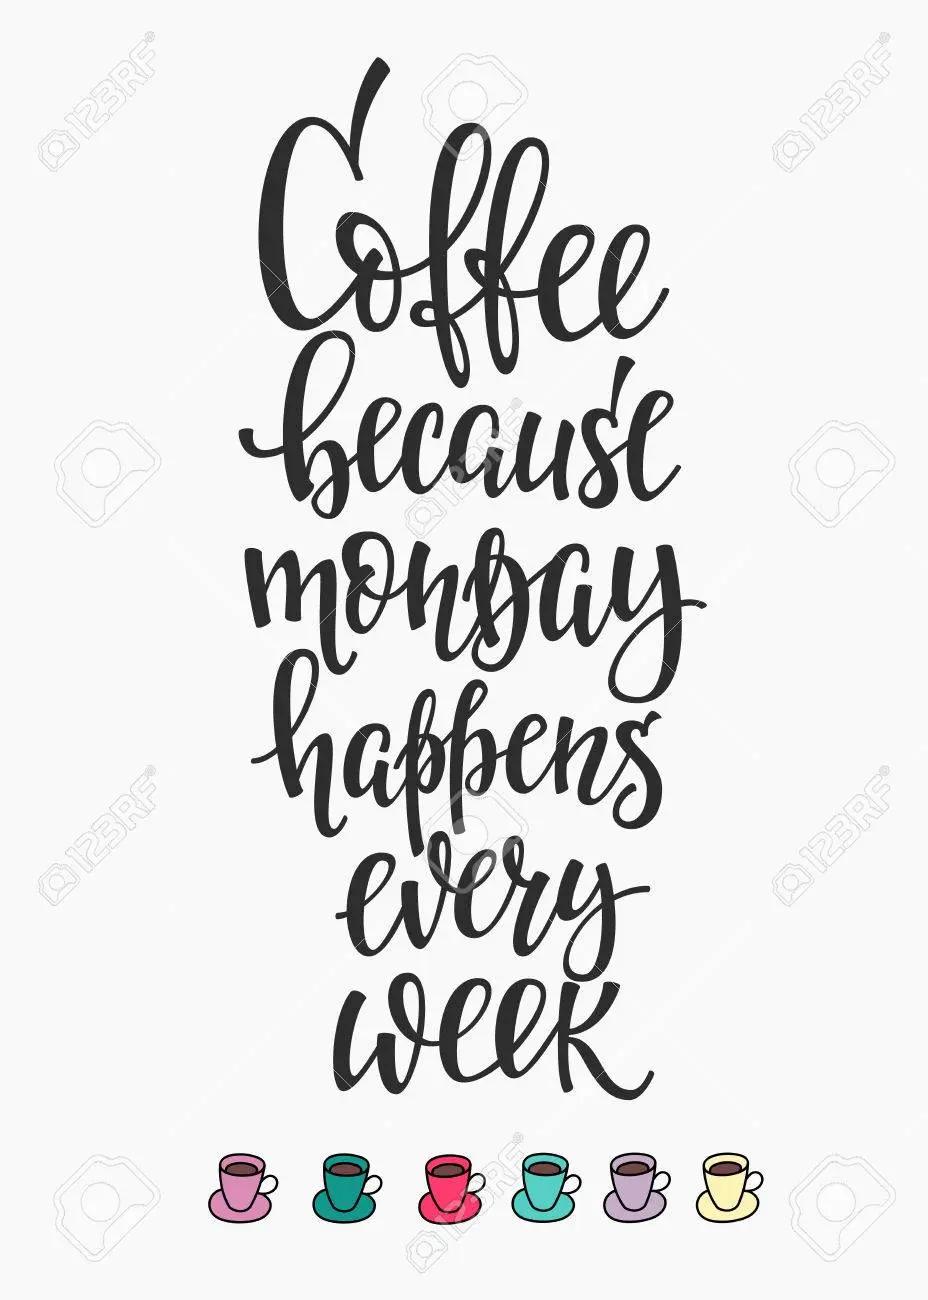 Monday happens every week #mondayCoffee